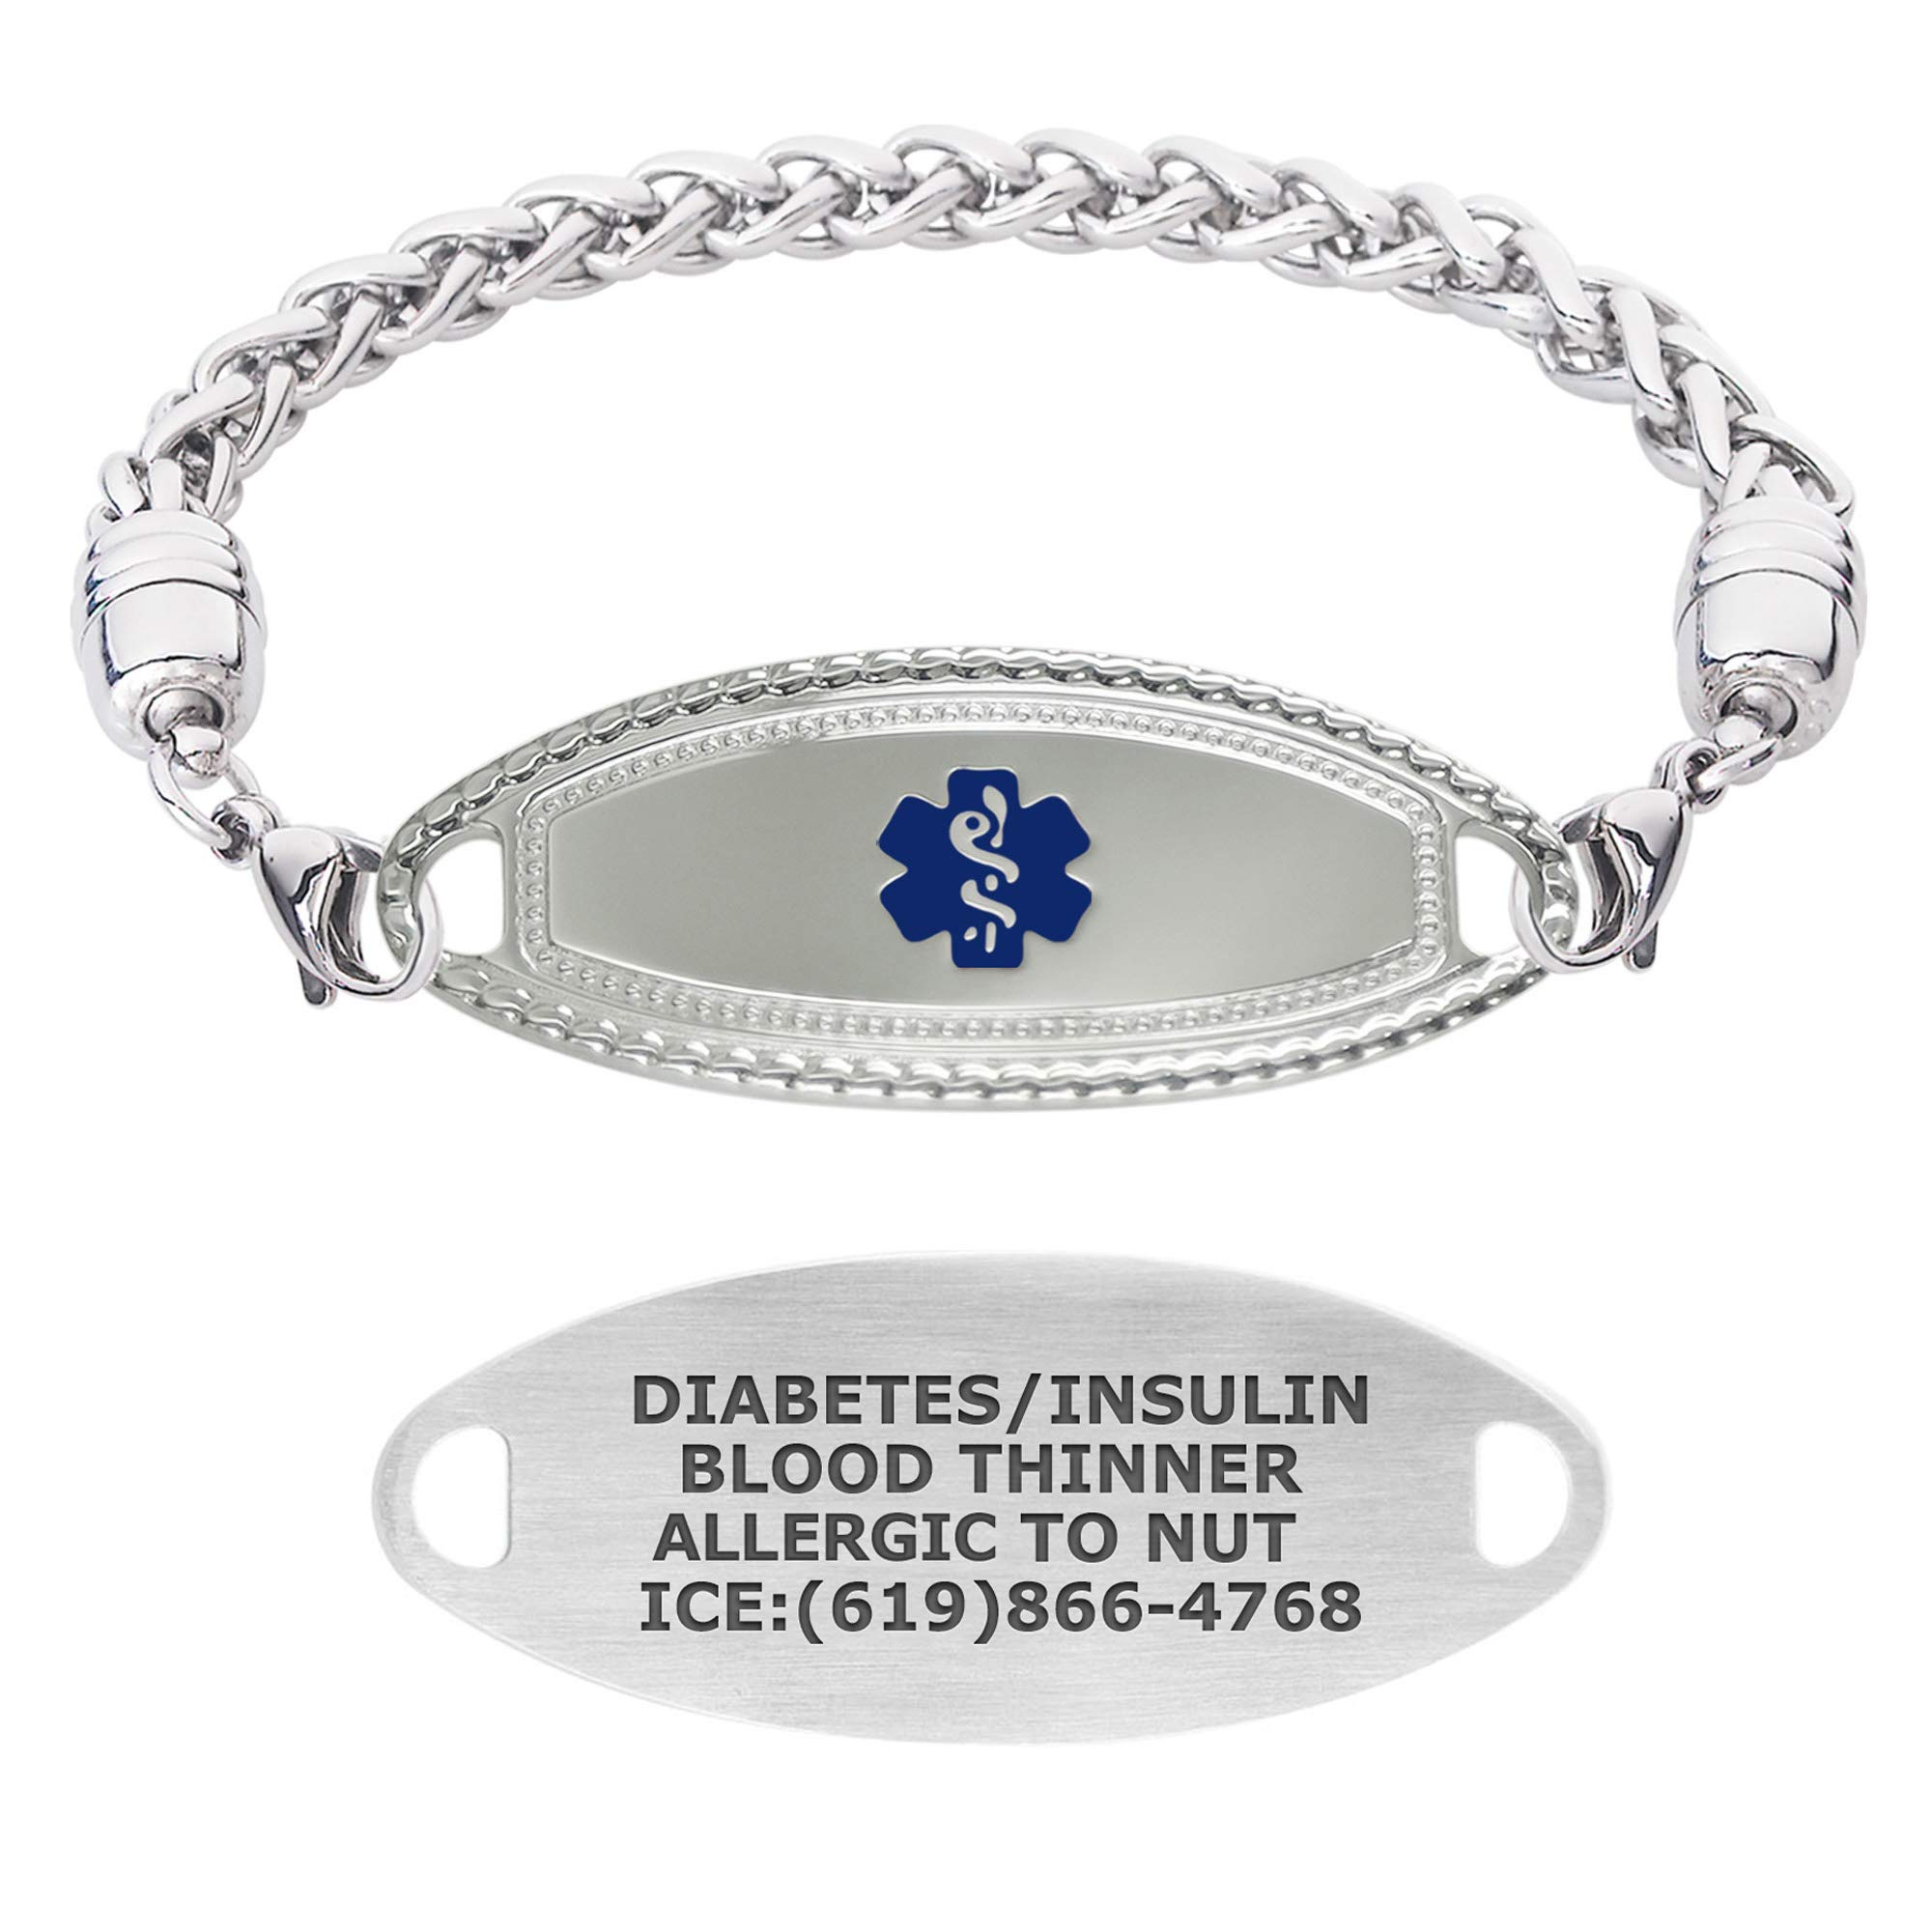 Divoti Custom Engraved Medical Alert Bracelets for Women, Stainless Steel Medical Bracelet, Medical ID Bracelet w/Free Engraving – Premier Tag w/Wheat– Color/Size